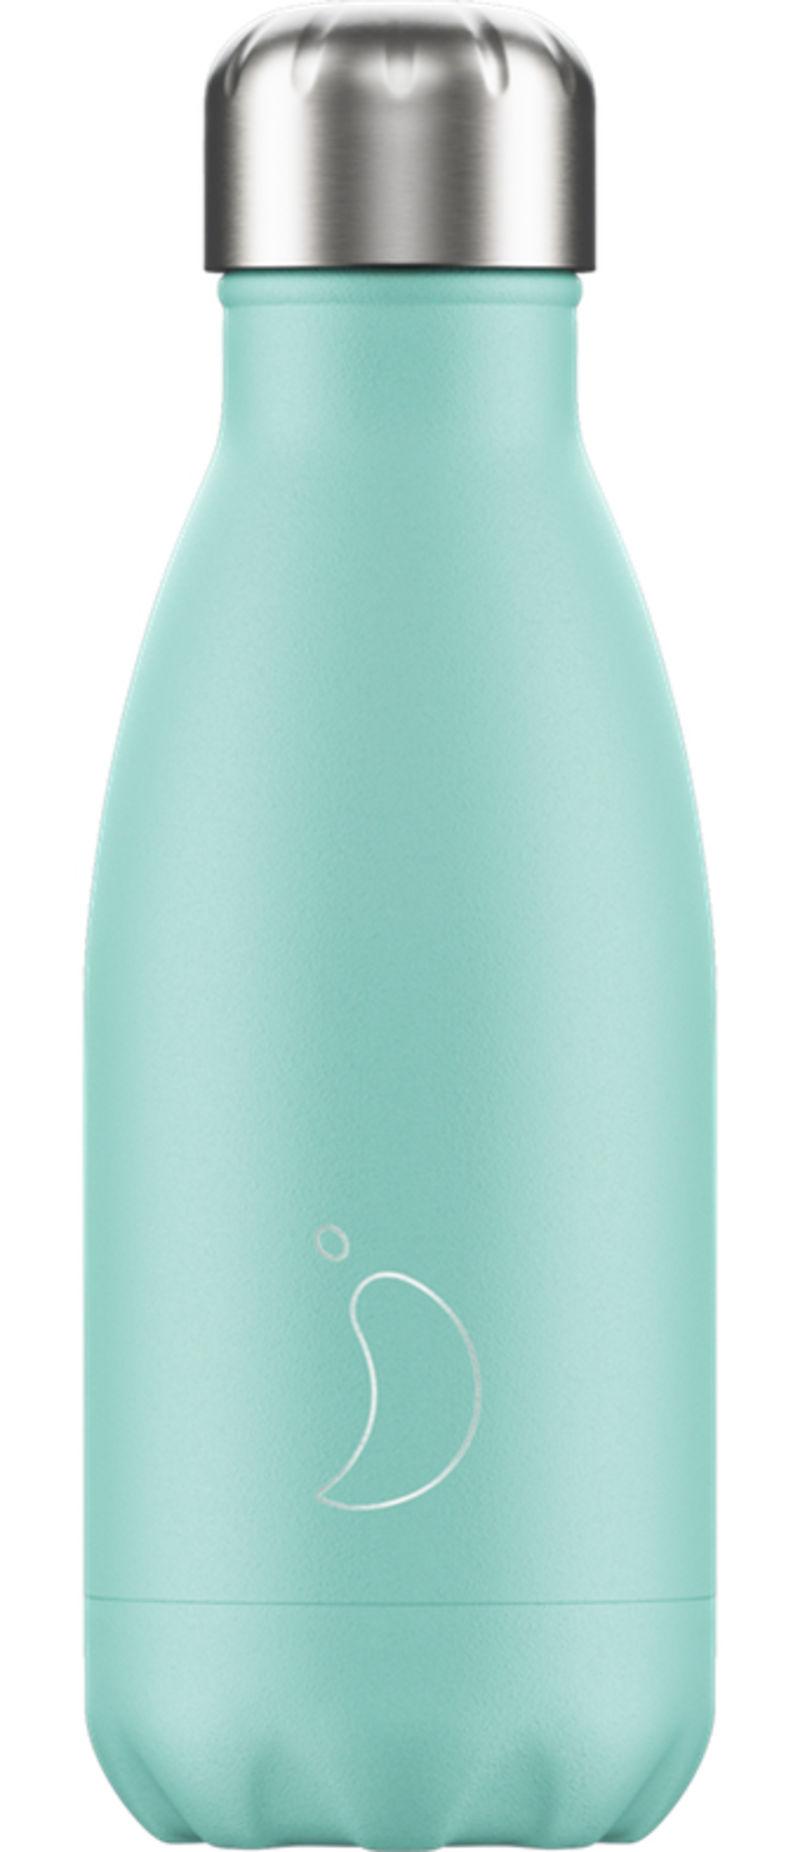 Botella Inox Menta Pastel 260ml -